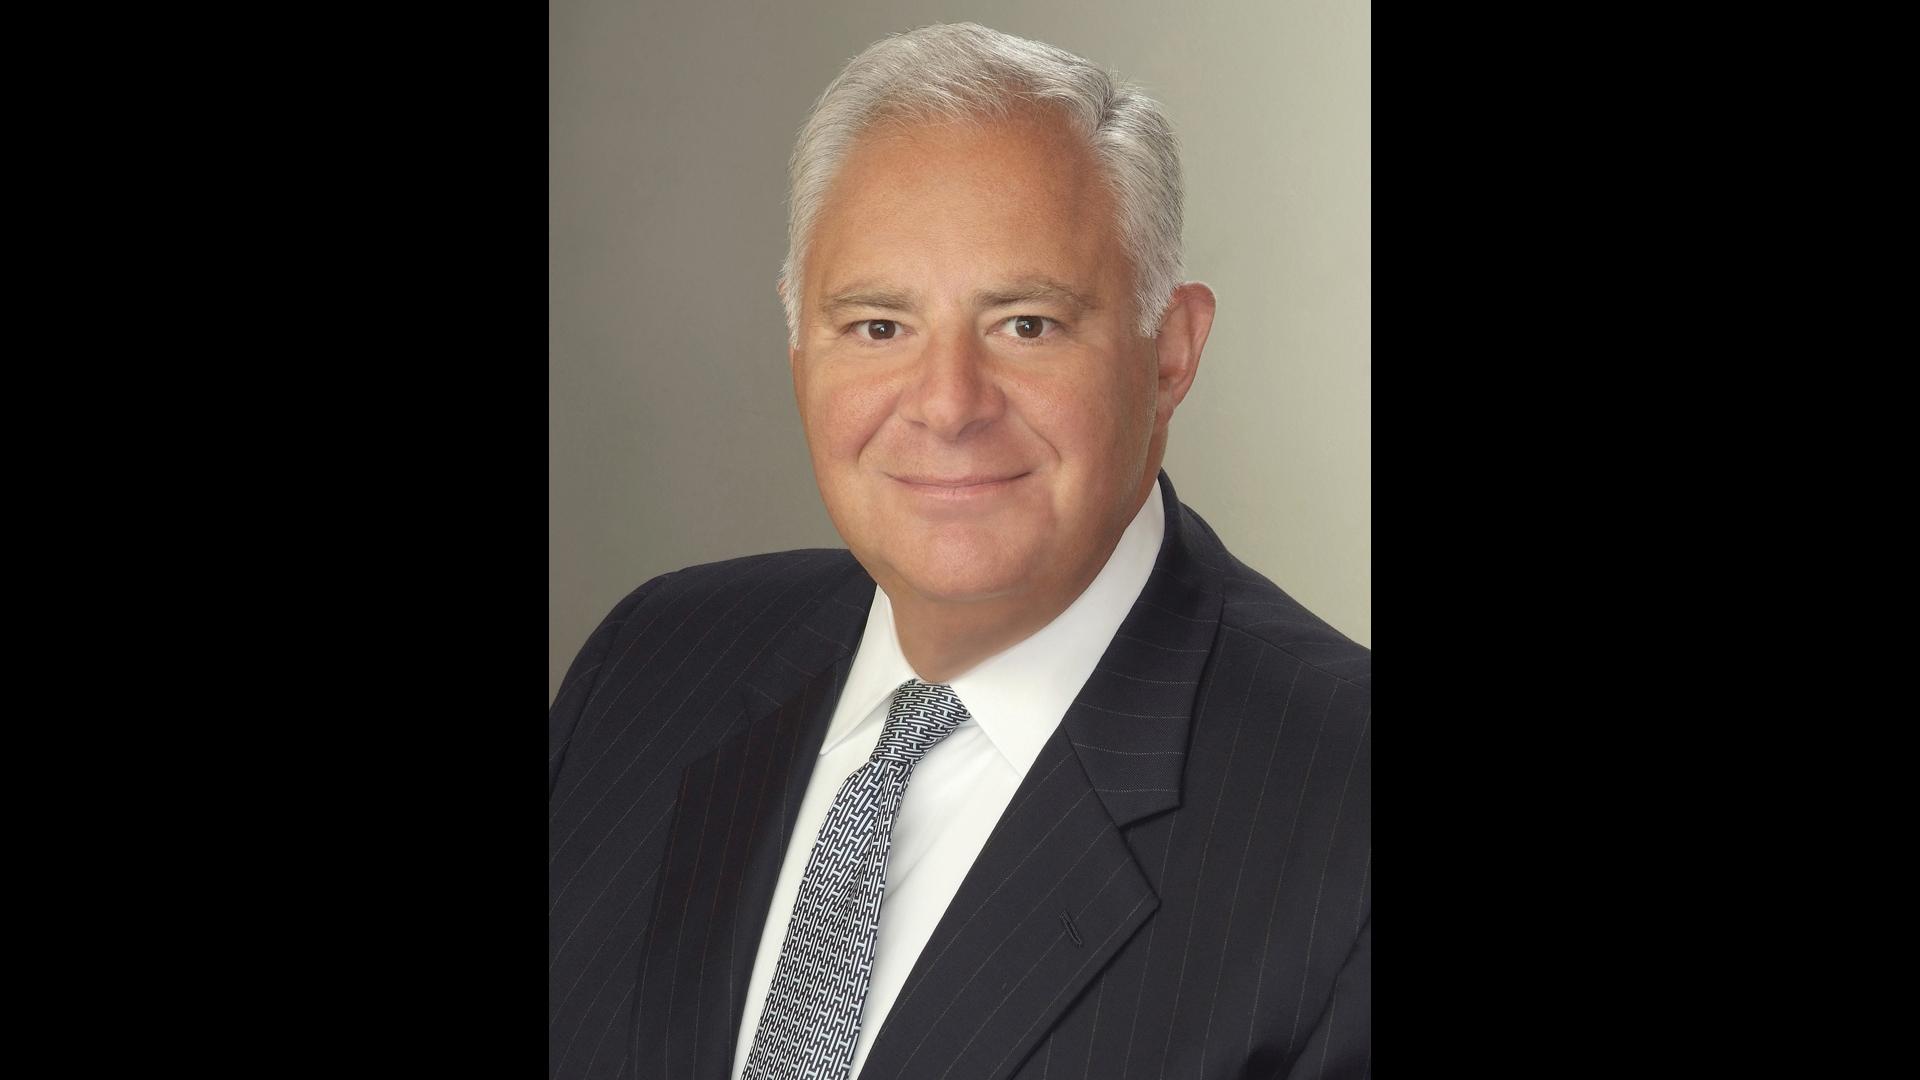 Bronson Healthcare CEO Frank Sardone 060319_1559592994262.jpg.jpg